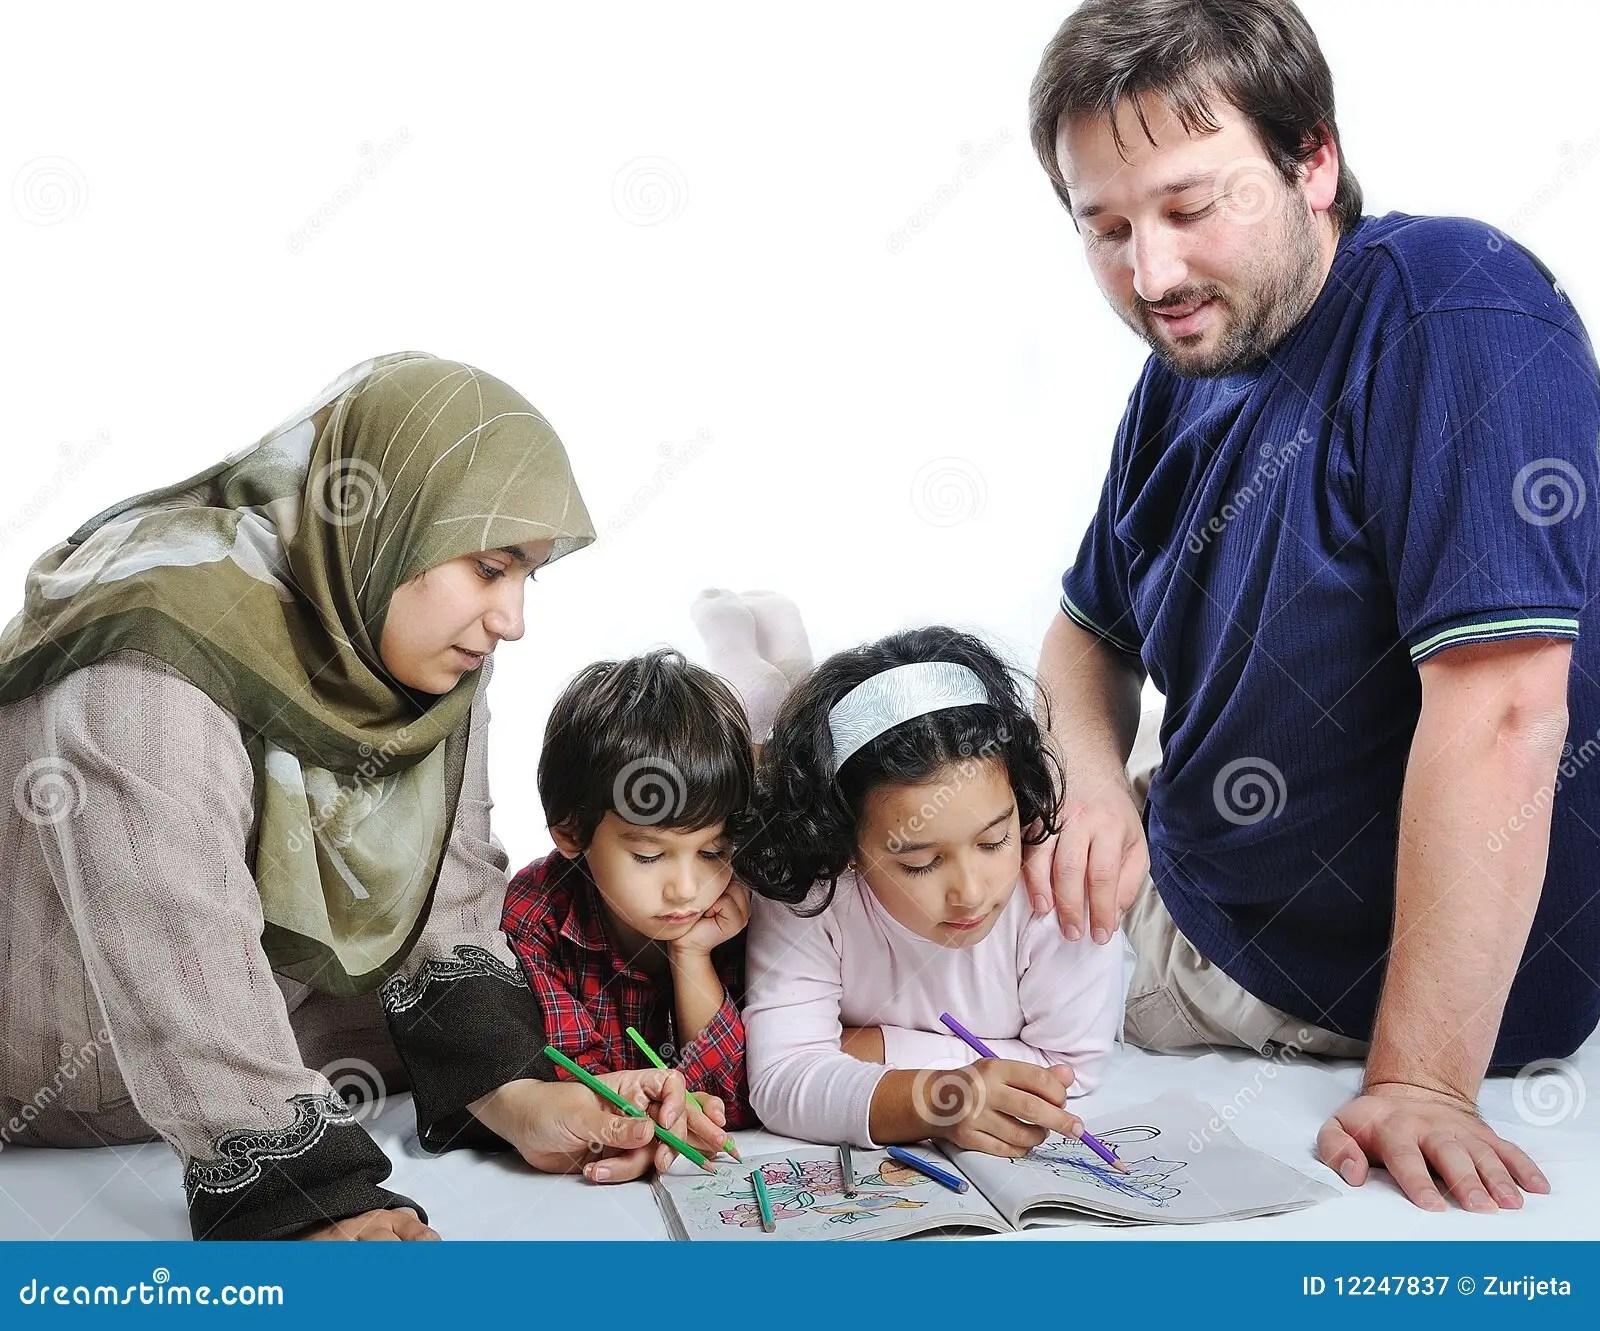 Muslim Girl Namaz Wallpaper Family Muslim Royalty Free Stock Photography Image 12247837